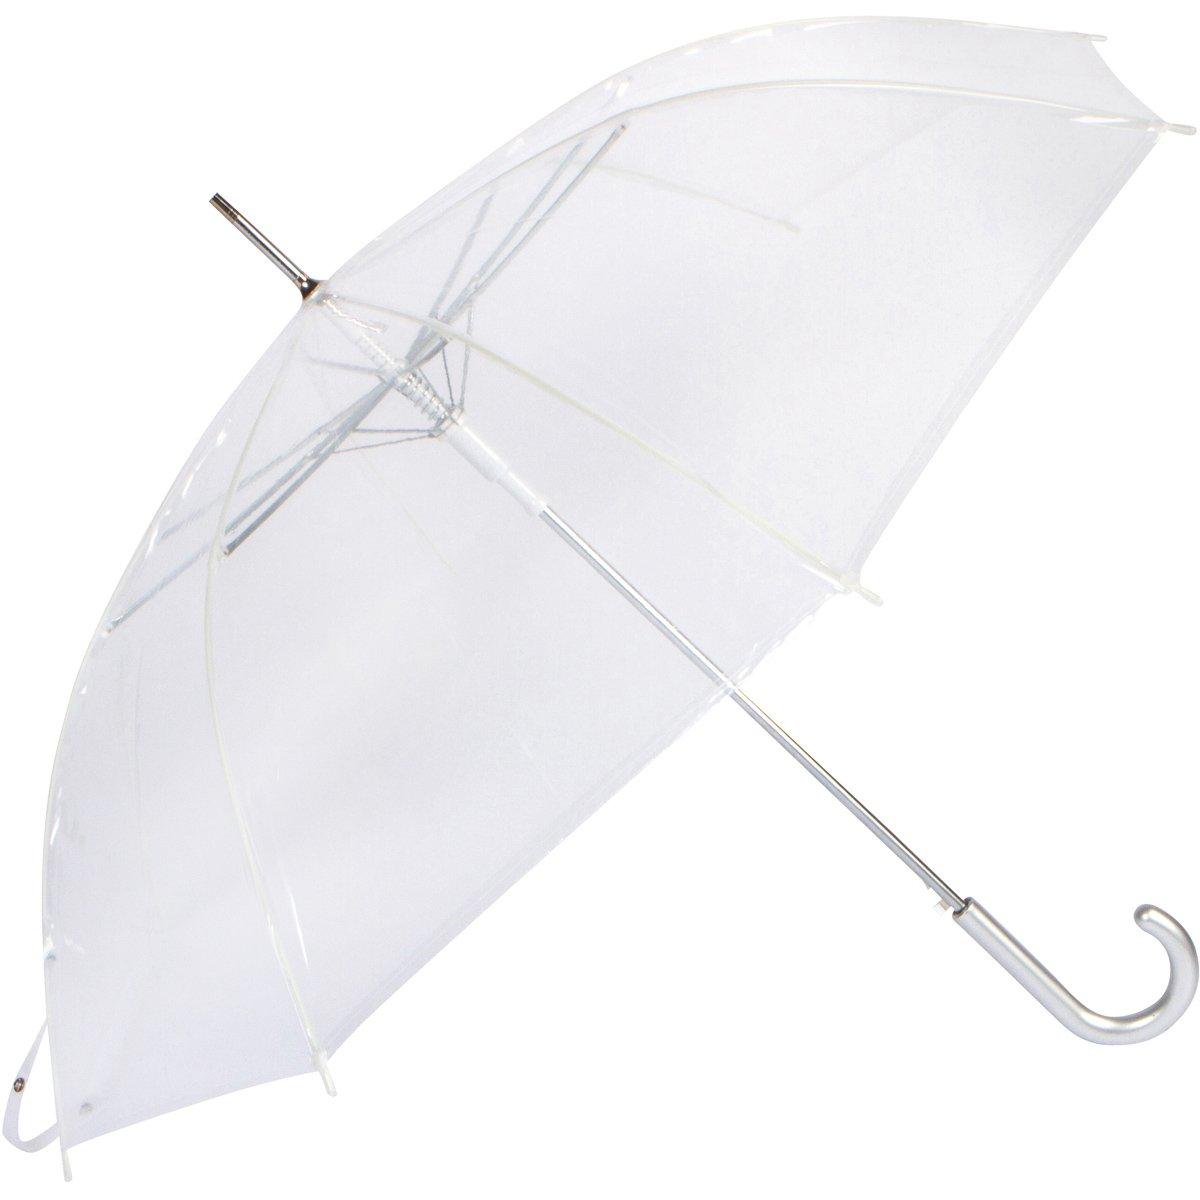 Cloak Umbrellas Auto Open Clear Umbrellas, 46'' ARC by Cloak Umbrellas (Image #2)